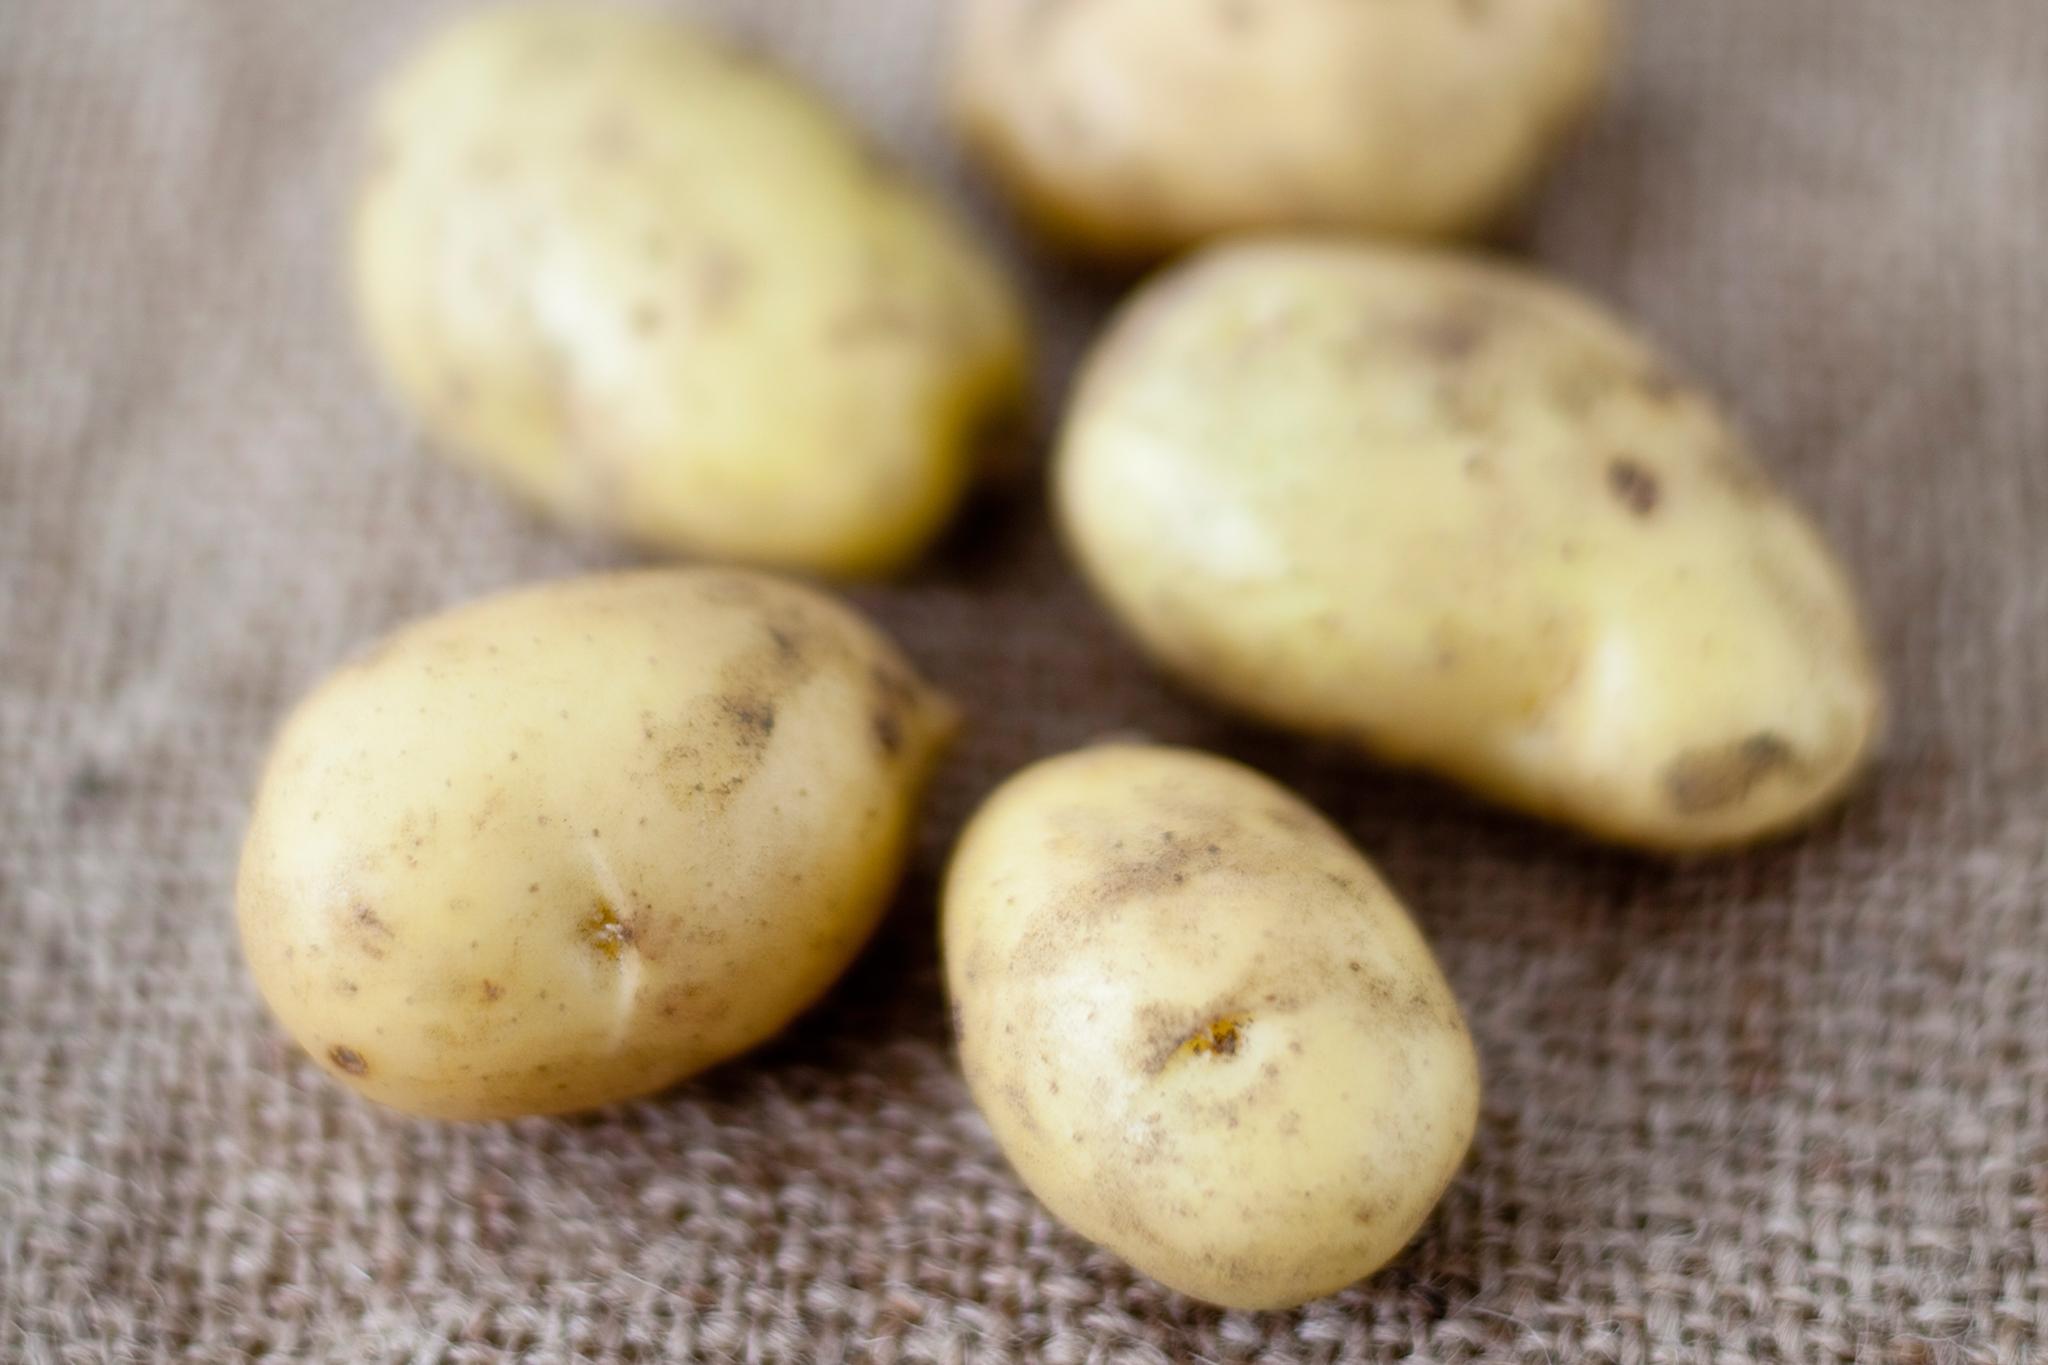 Potato types explained